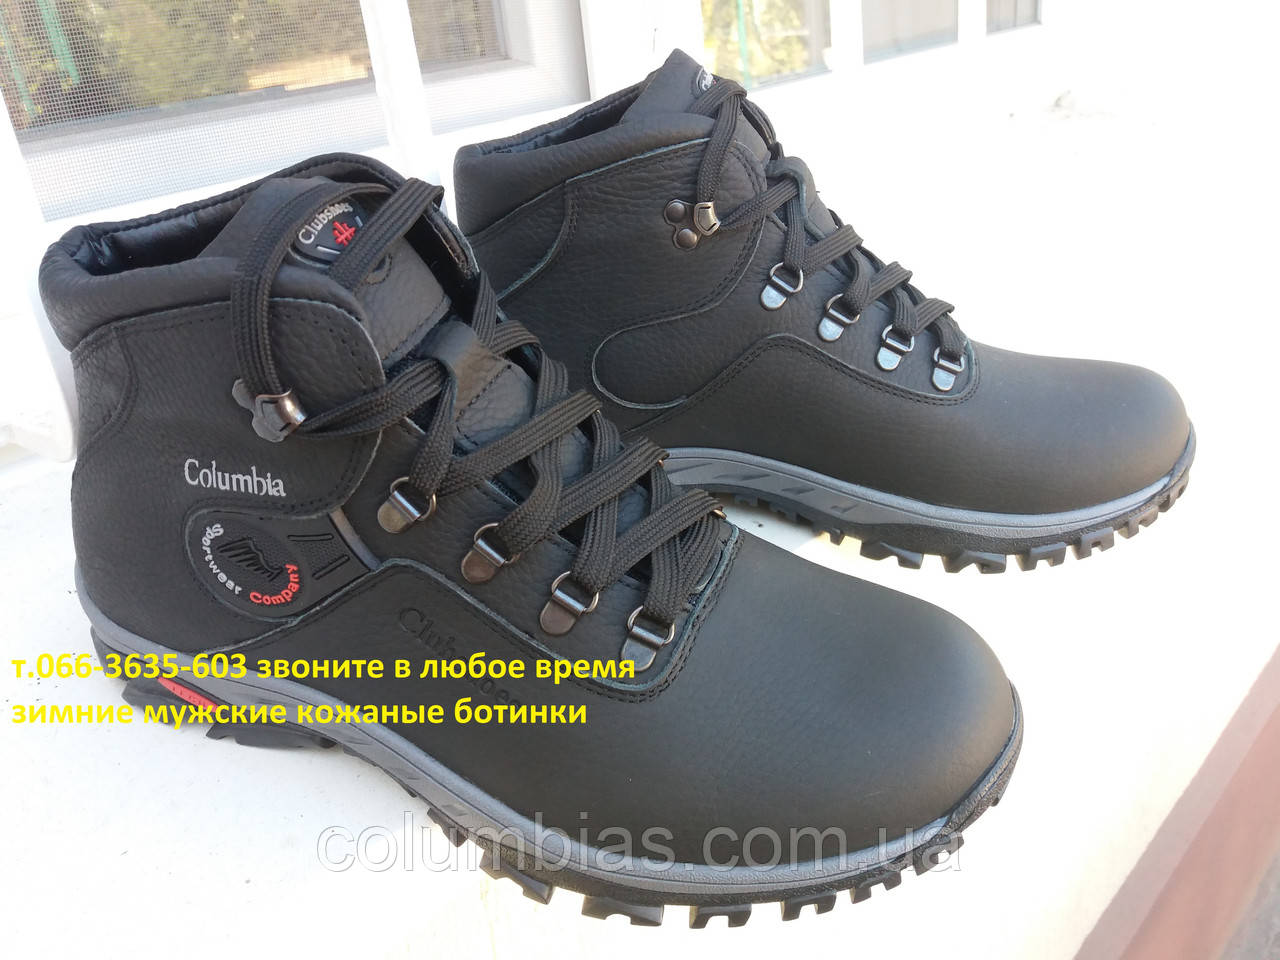 Ботинки зимние мужские Columbiia р.42